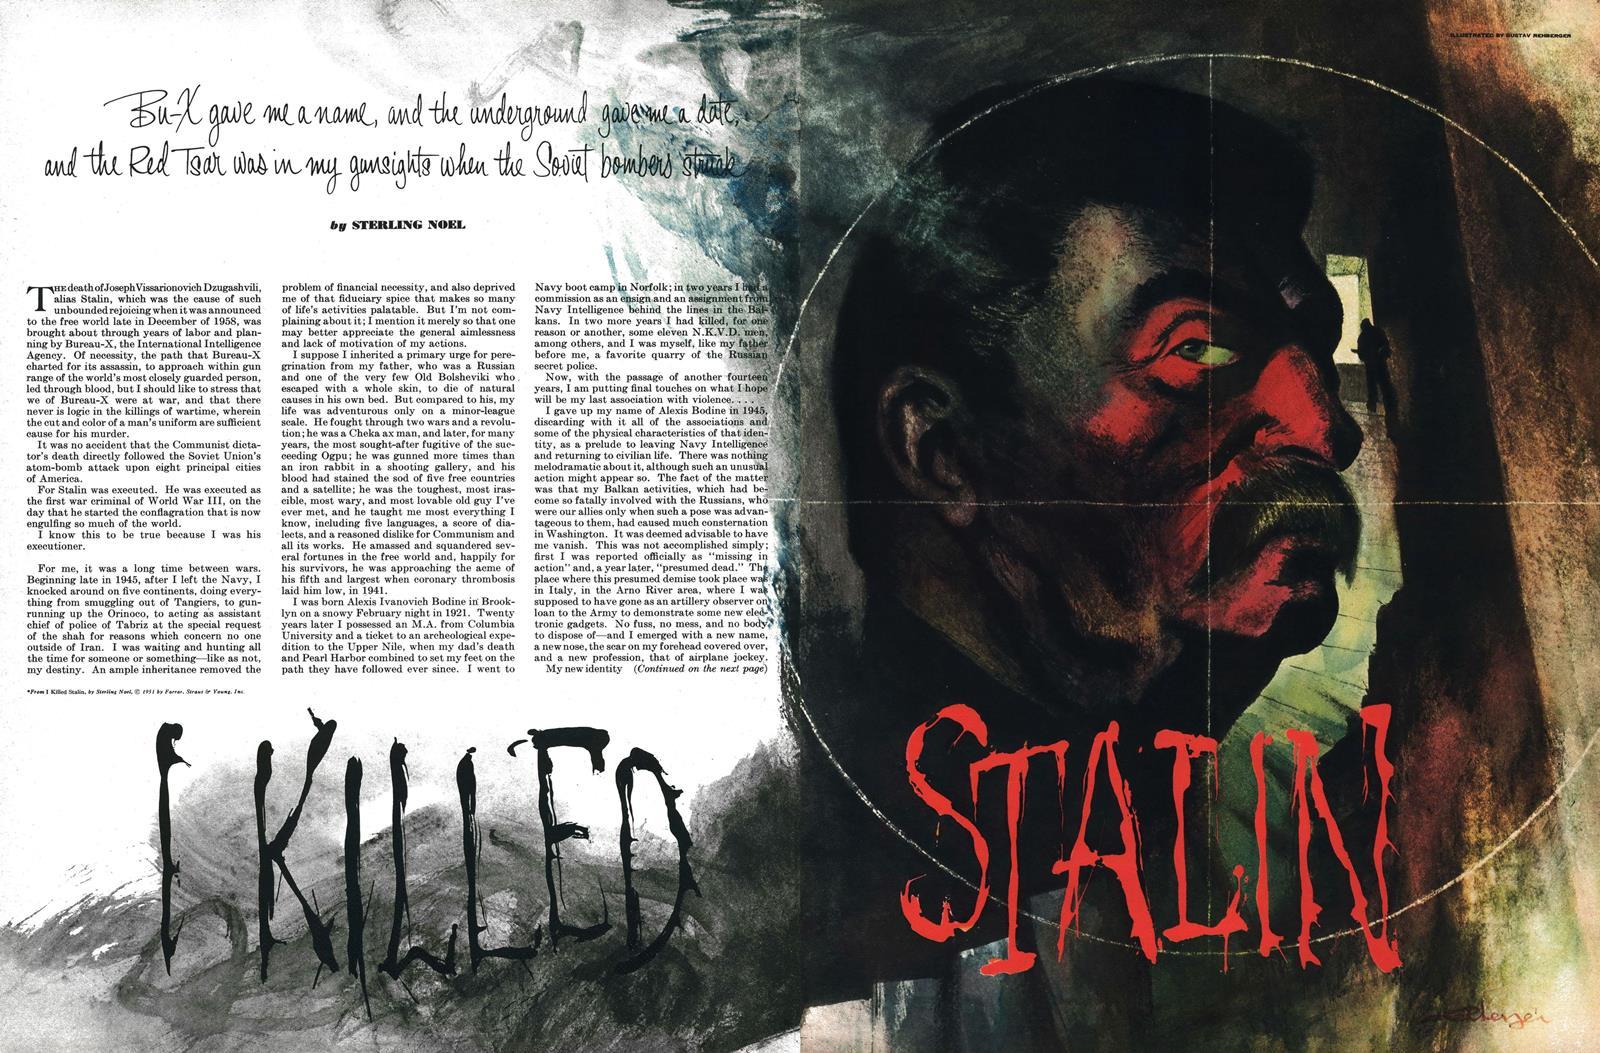 February 1952 - I Killed Stalin